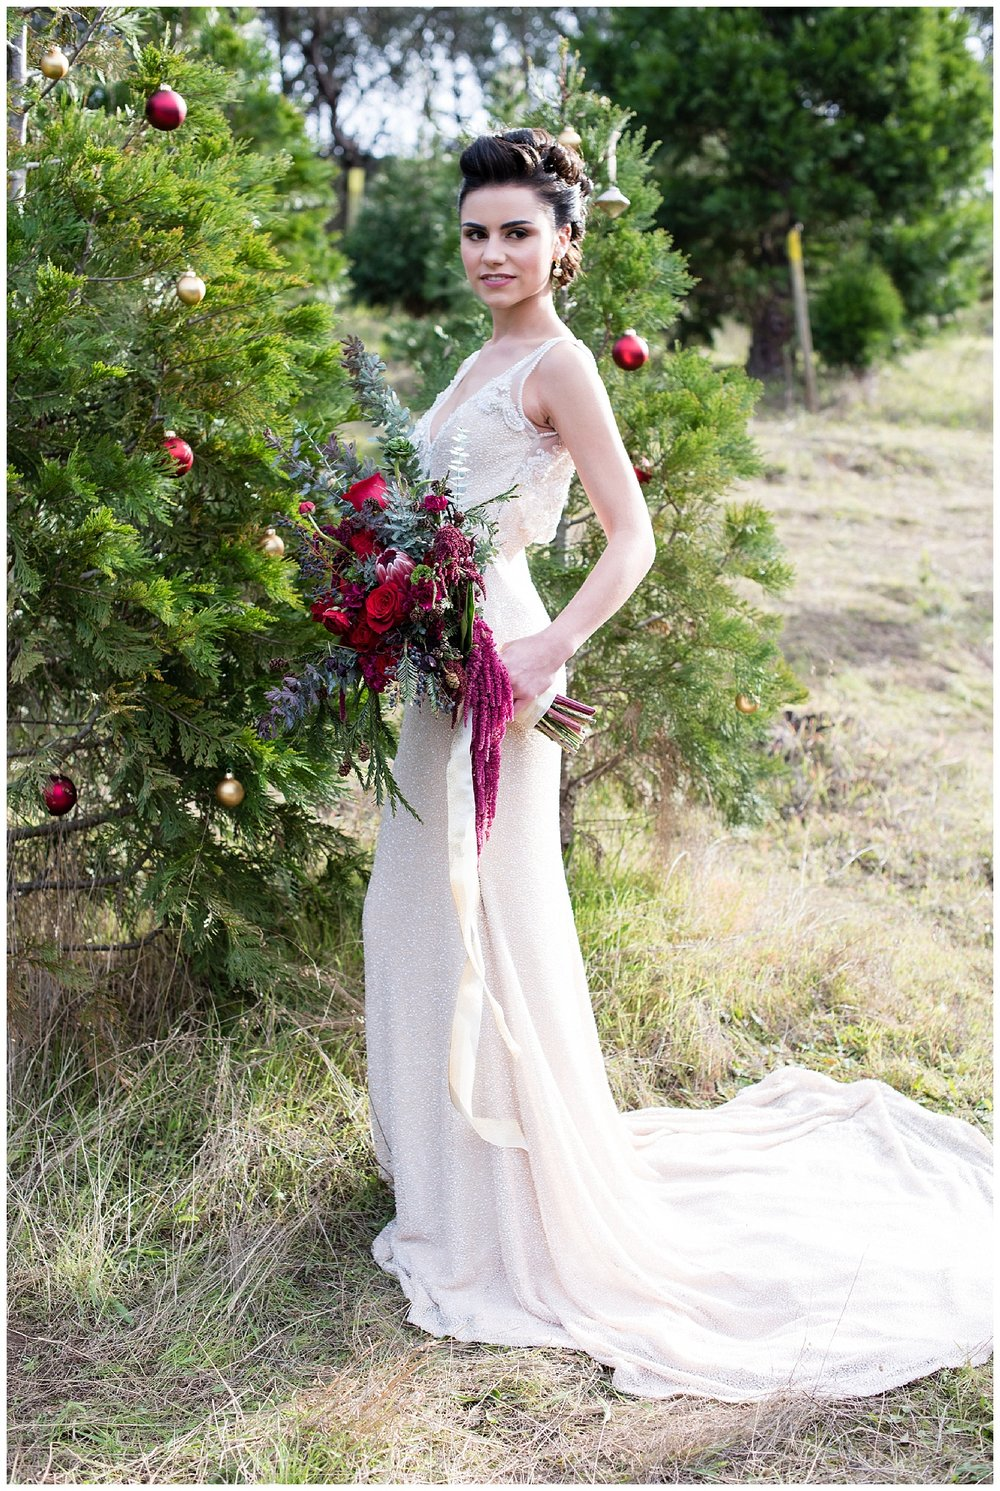 christmas-bride-badgley-mischka-beaded-wedding-dress.jpg